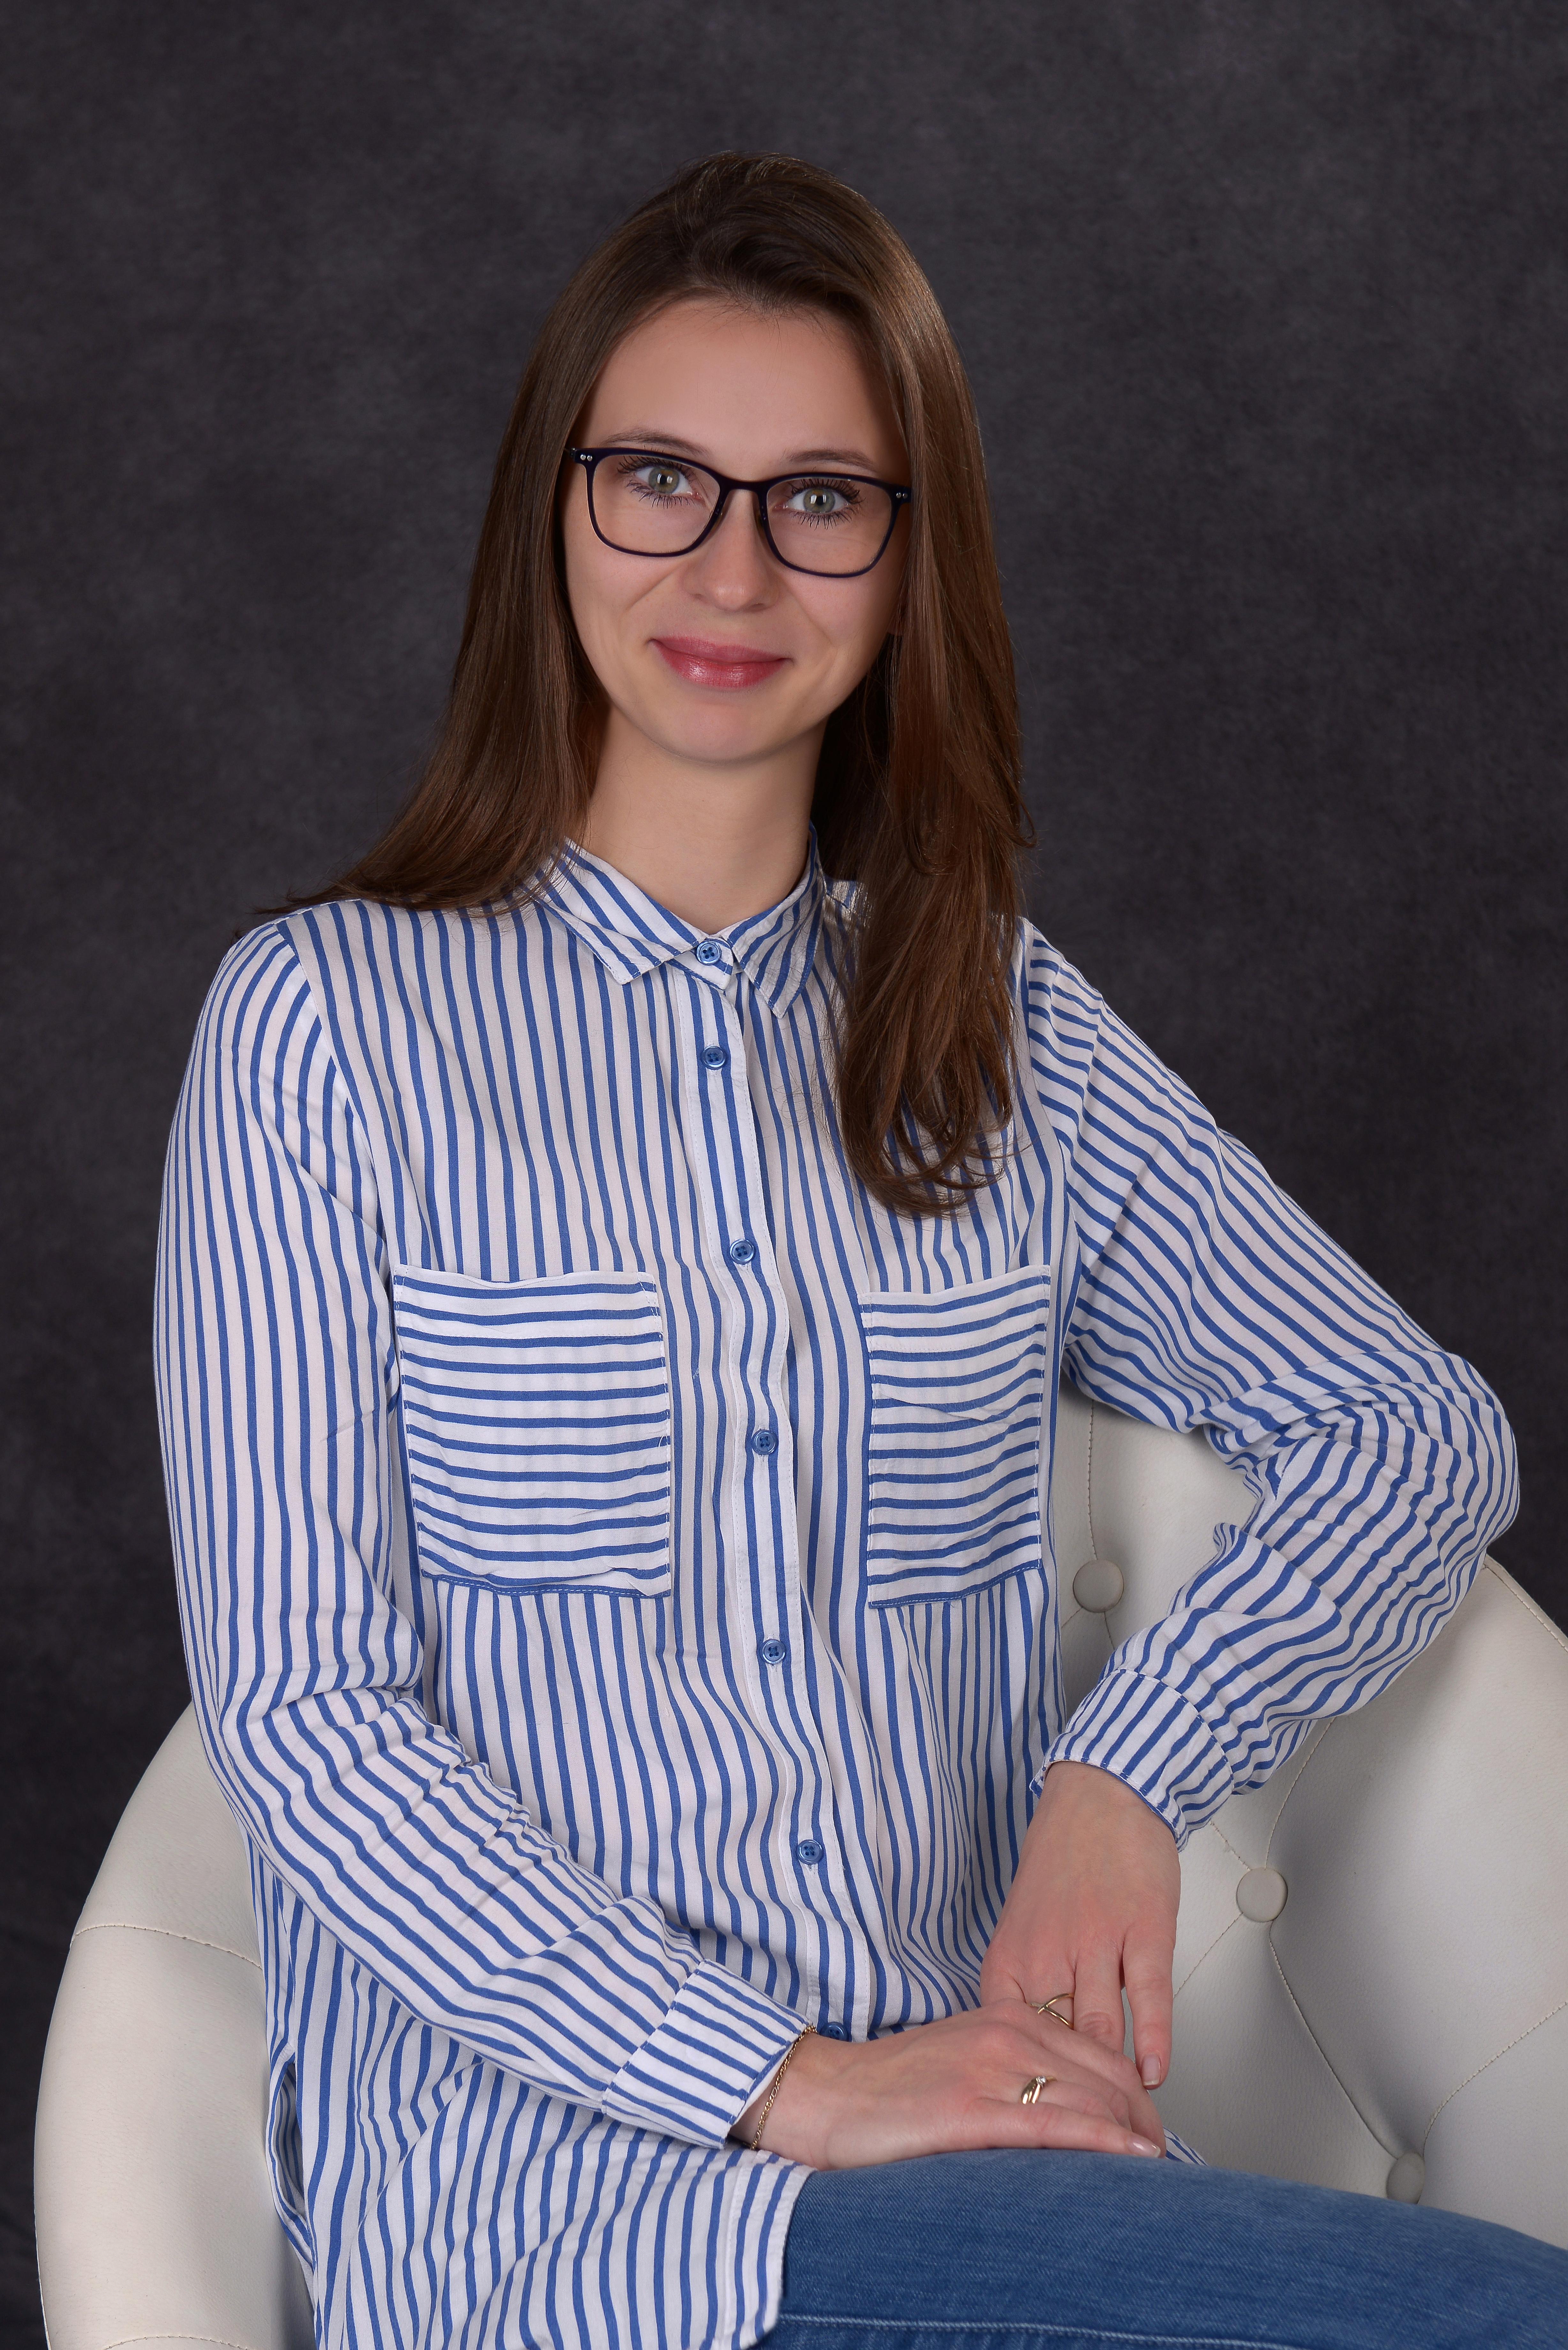 Kinga Termena-Kwiatkowska